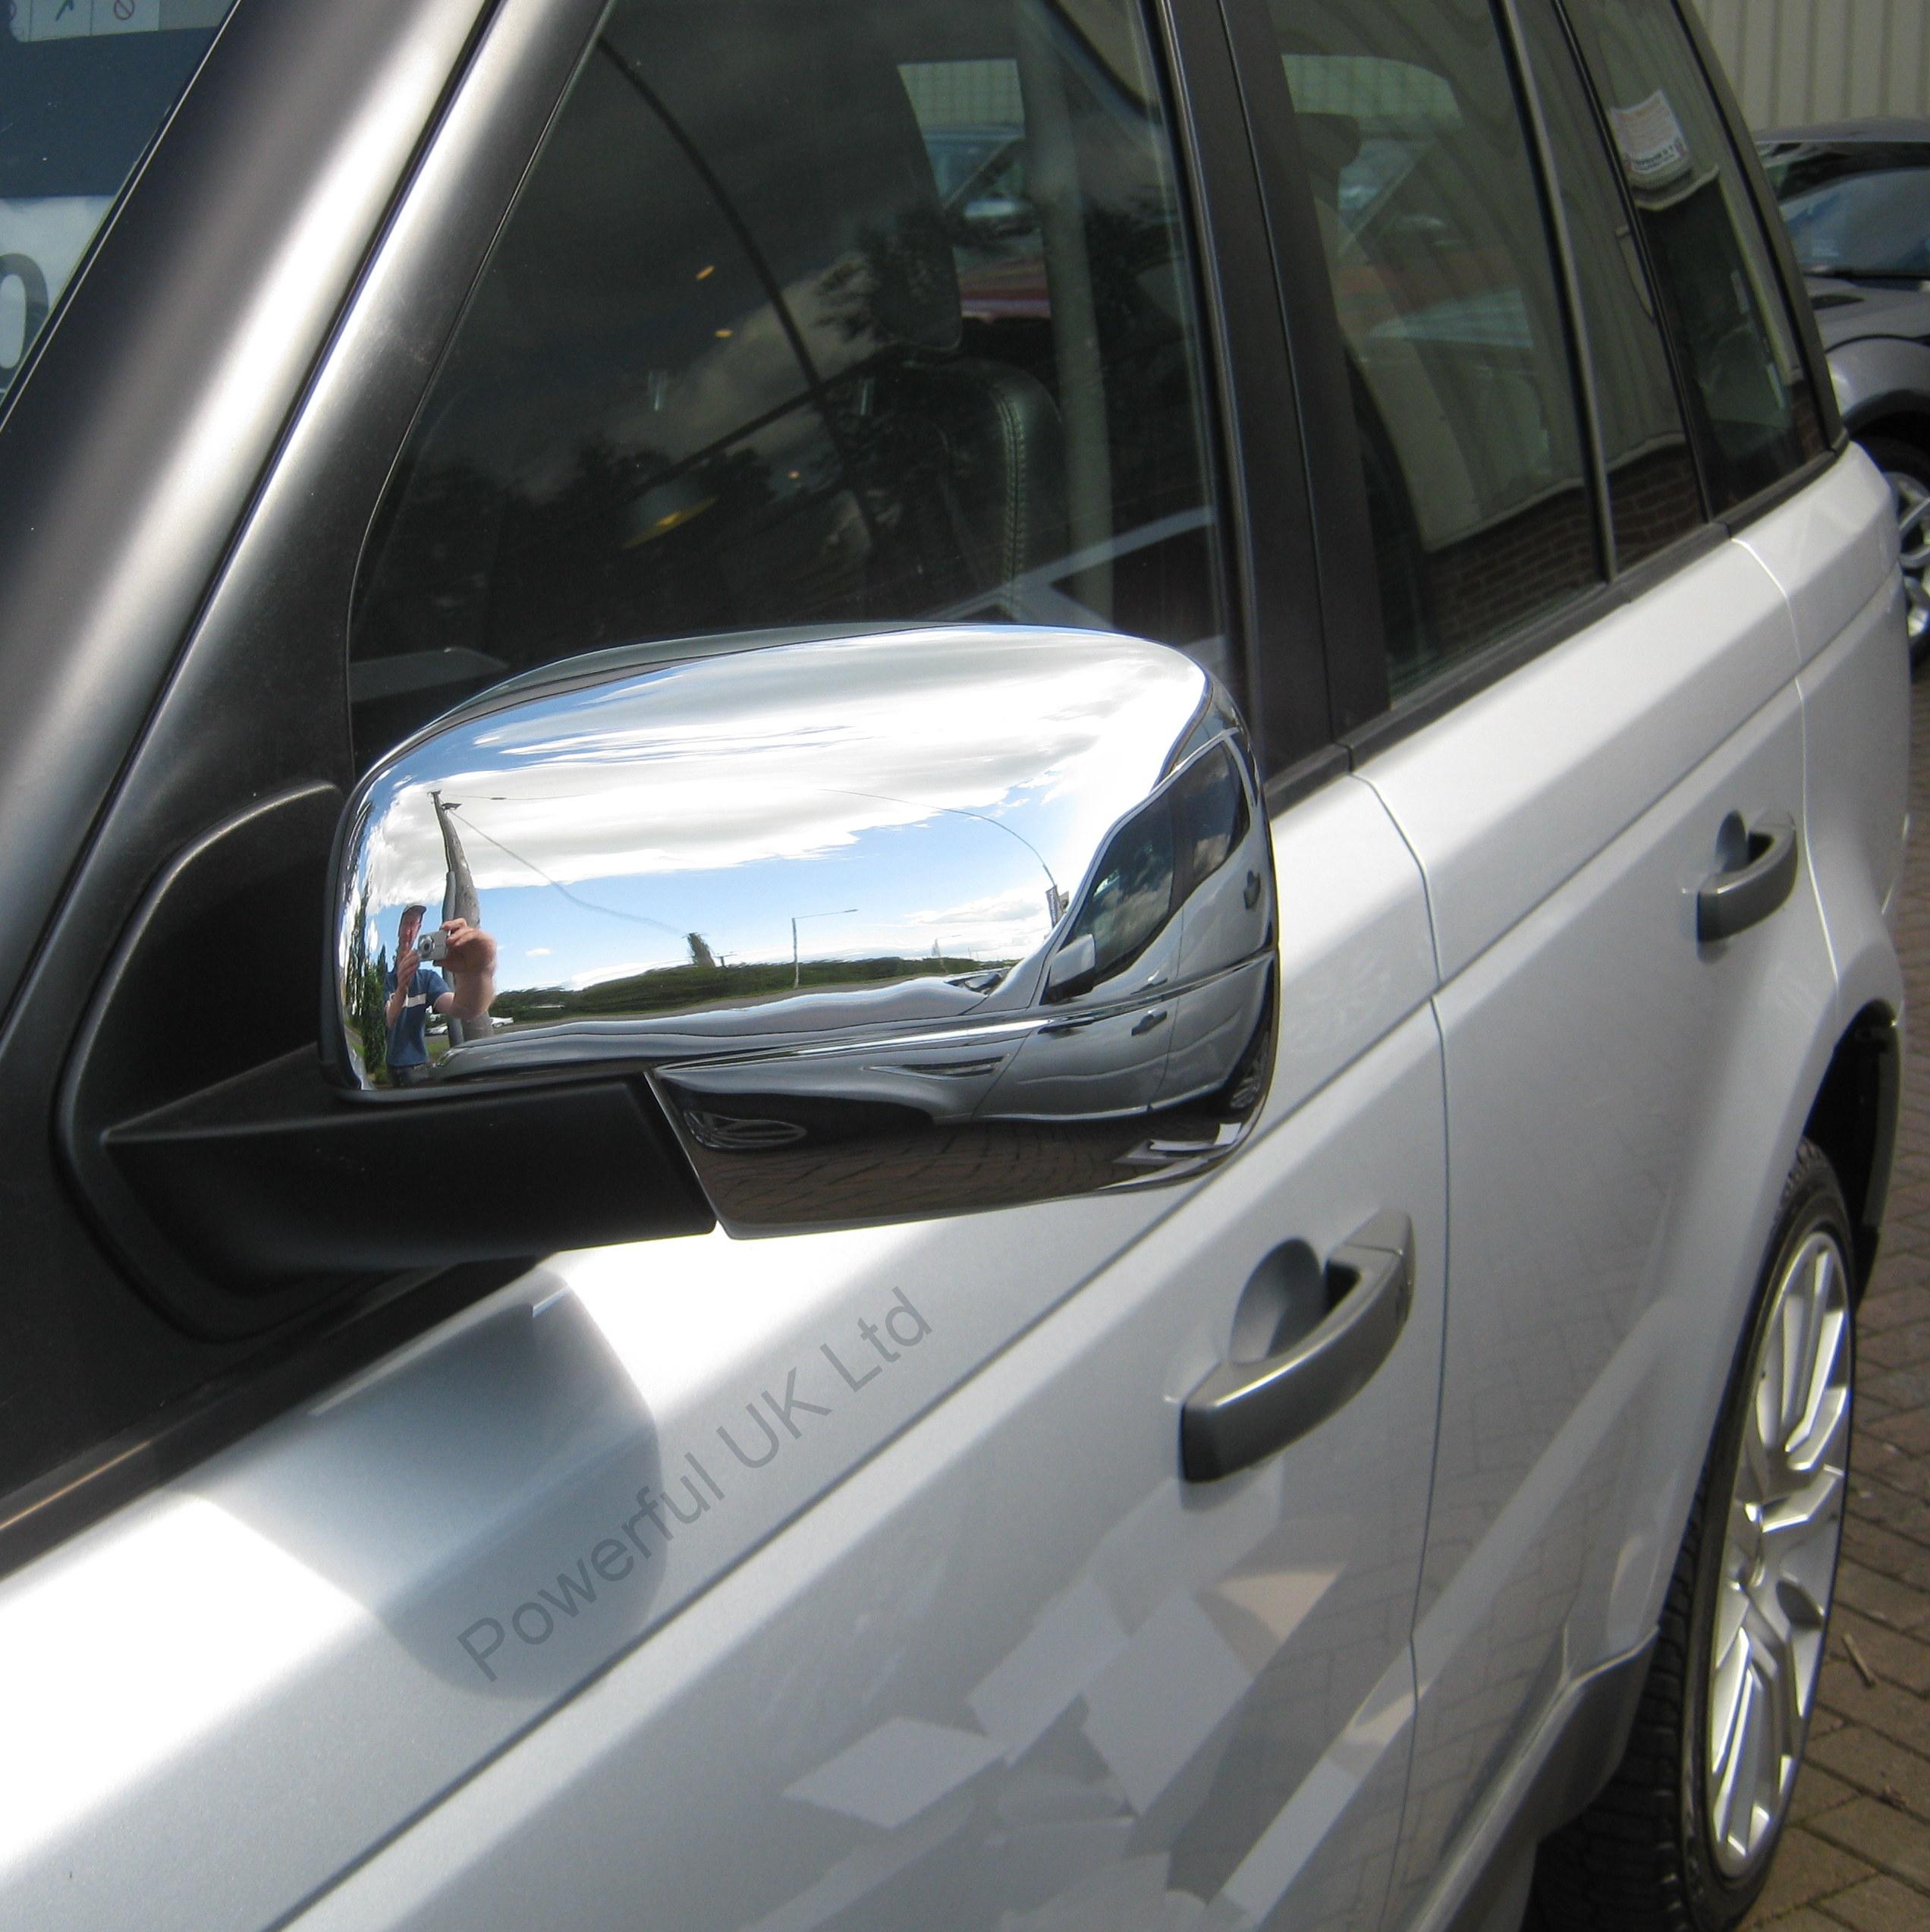 8//10 Diesel ab Bj Rau Fussmatten CASINO beige Nissan Murano 5trg